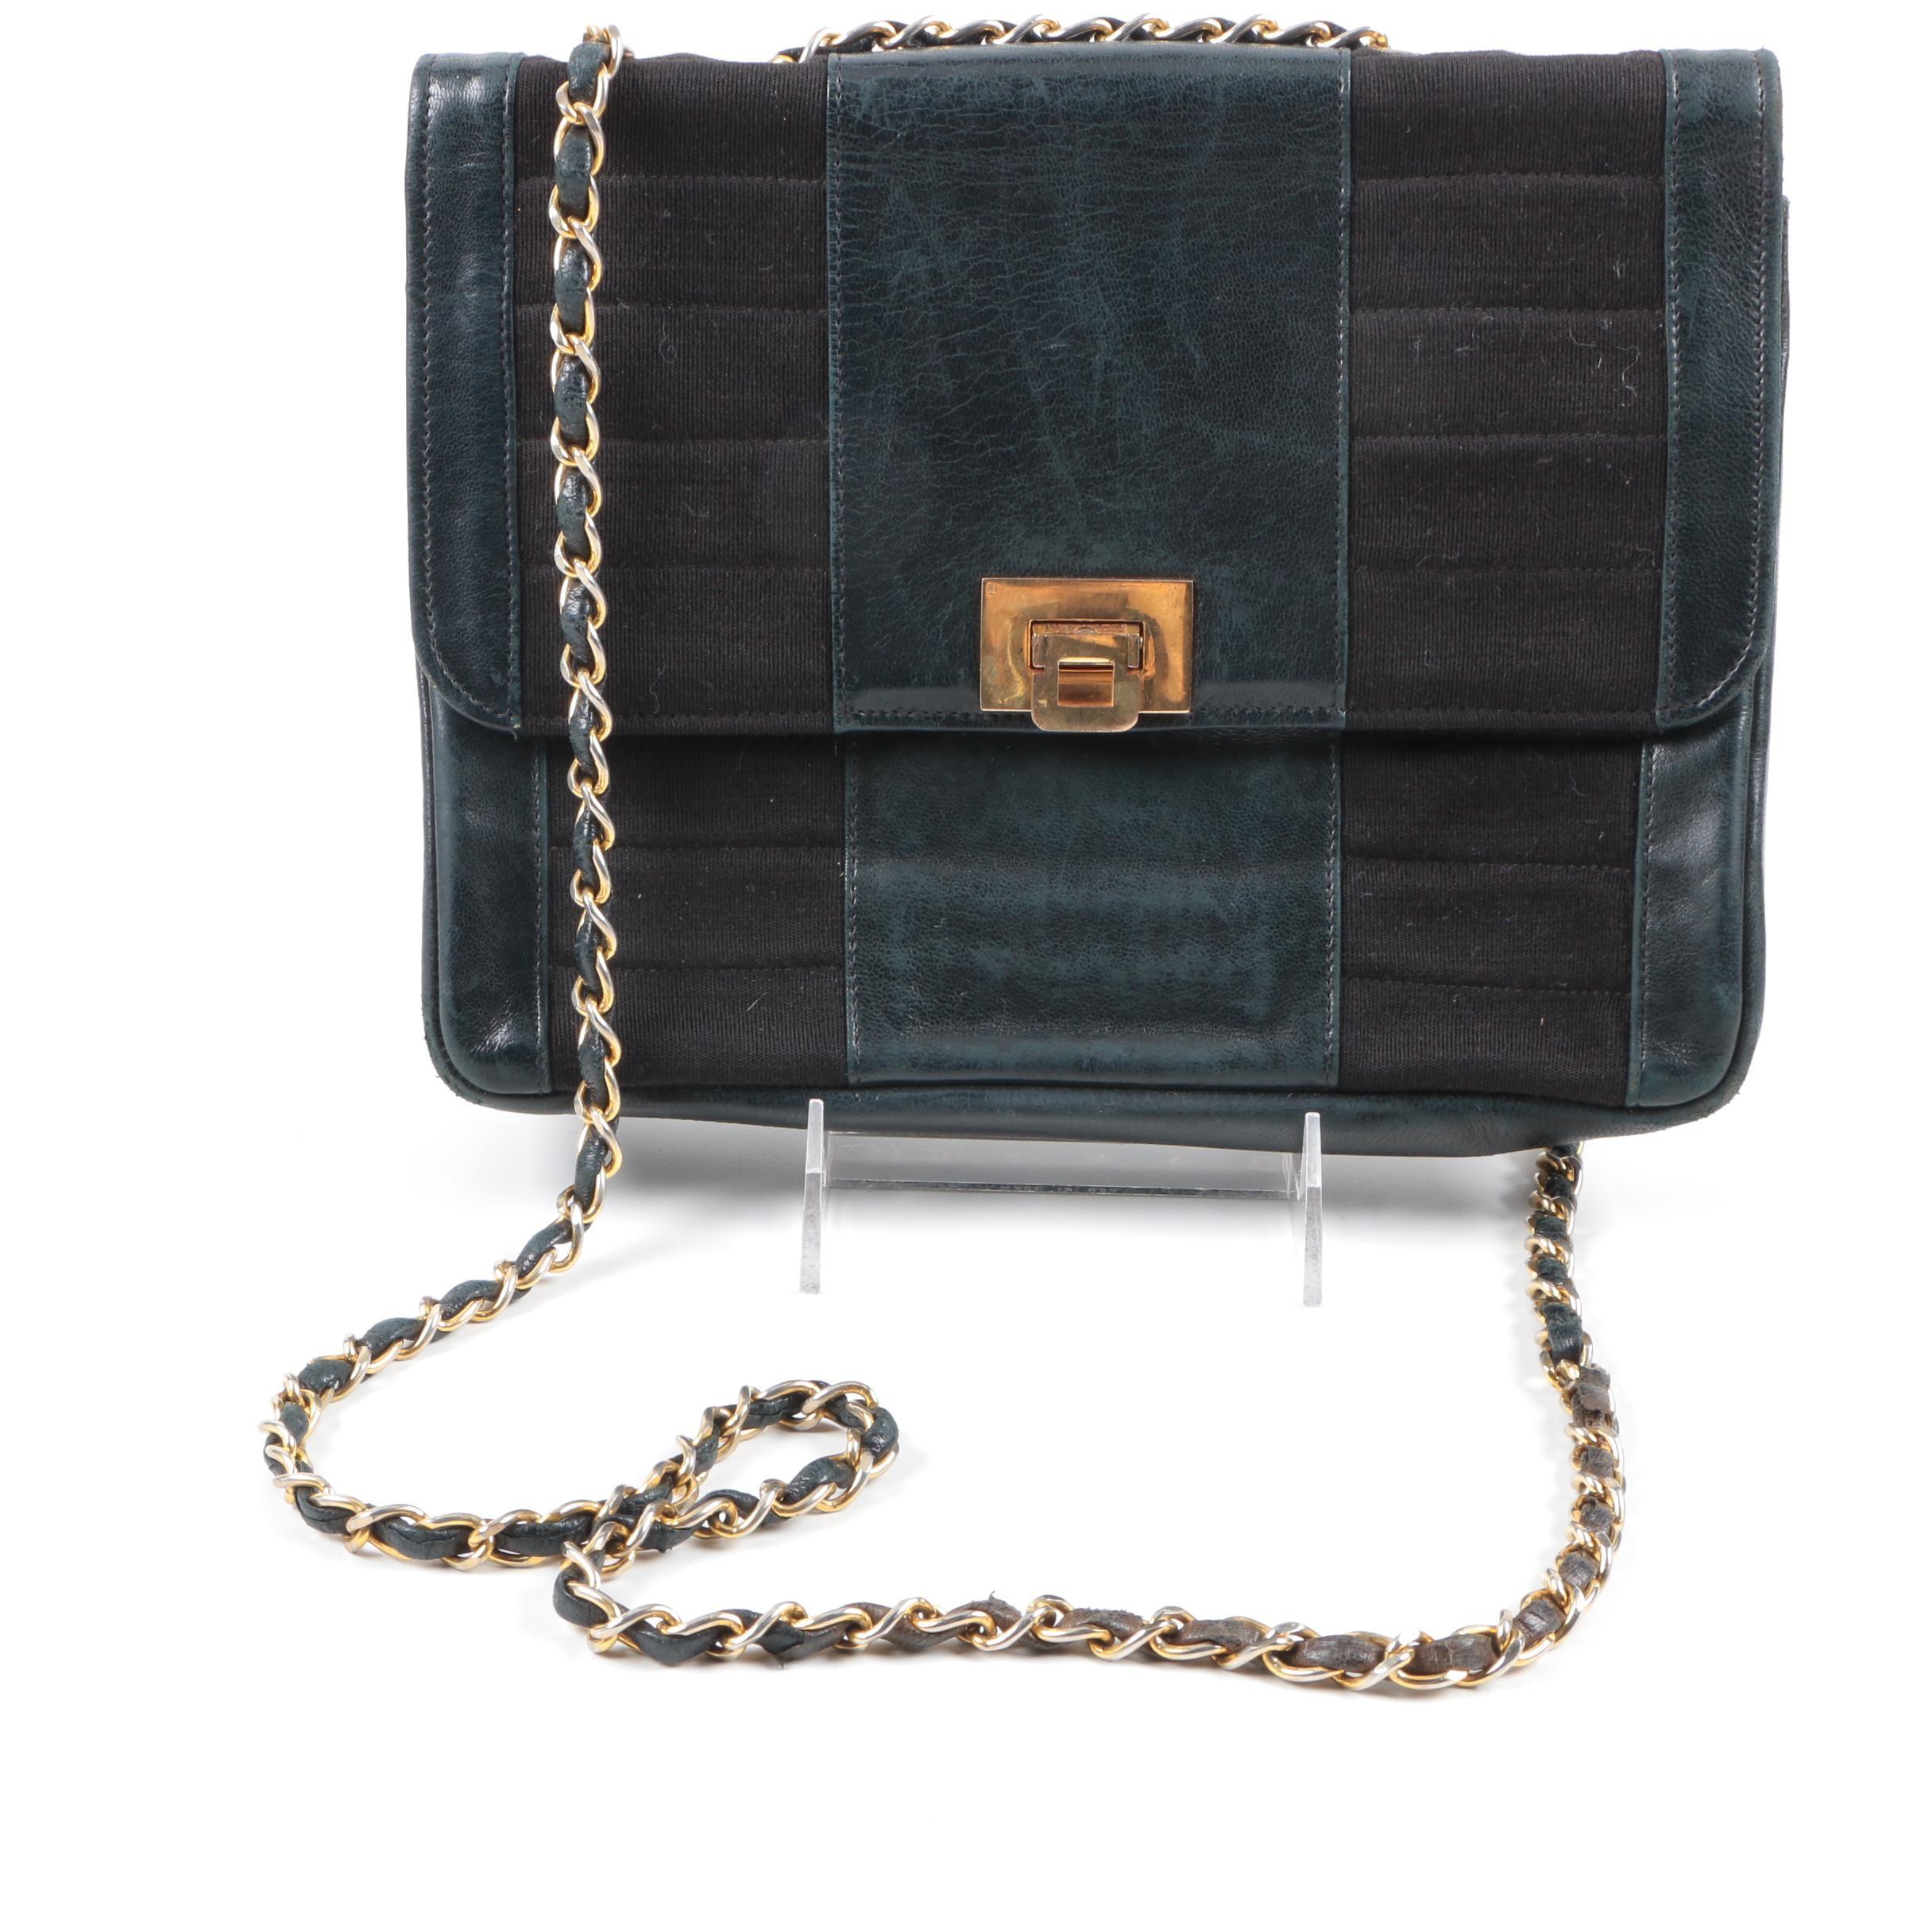 Circa 1980's Chanel Pleated Flap Handbag